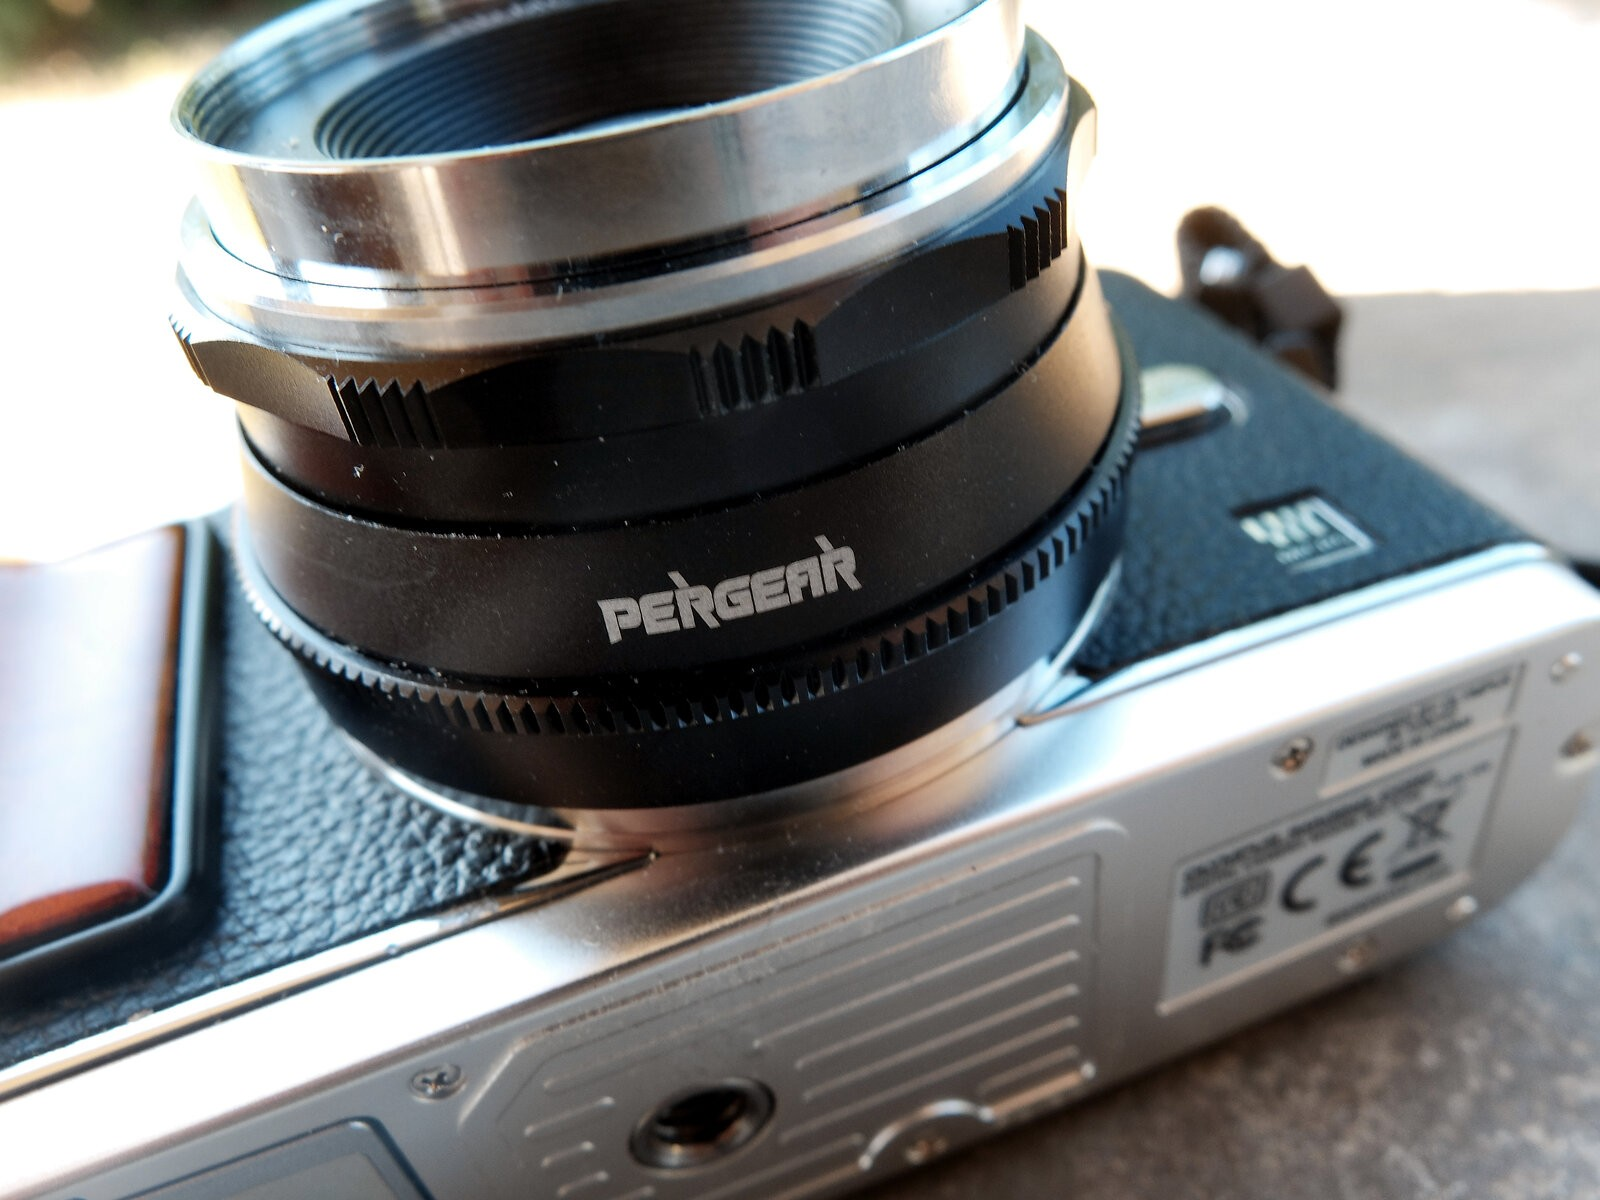 X30_July21_Pergear_lens_Bottom.jpg